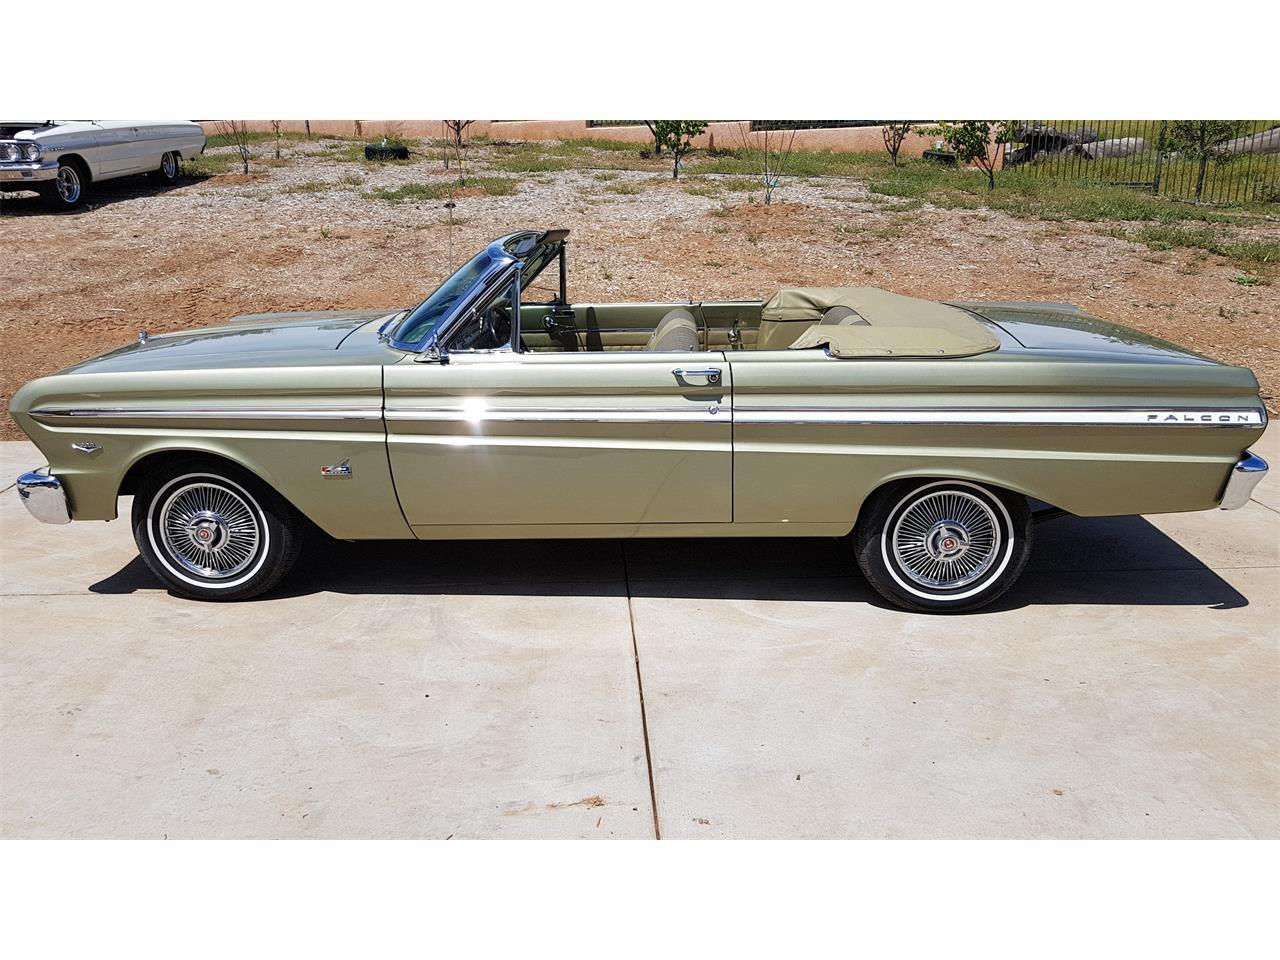 1965 Ford Falcon (CC-1331289) for sale in Acton, California